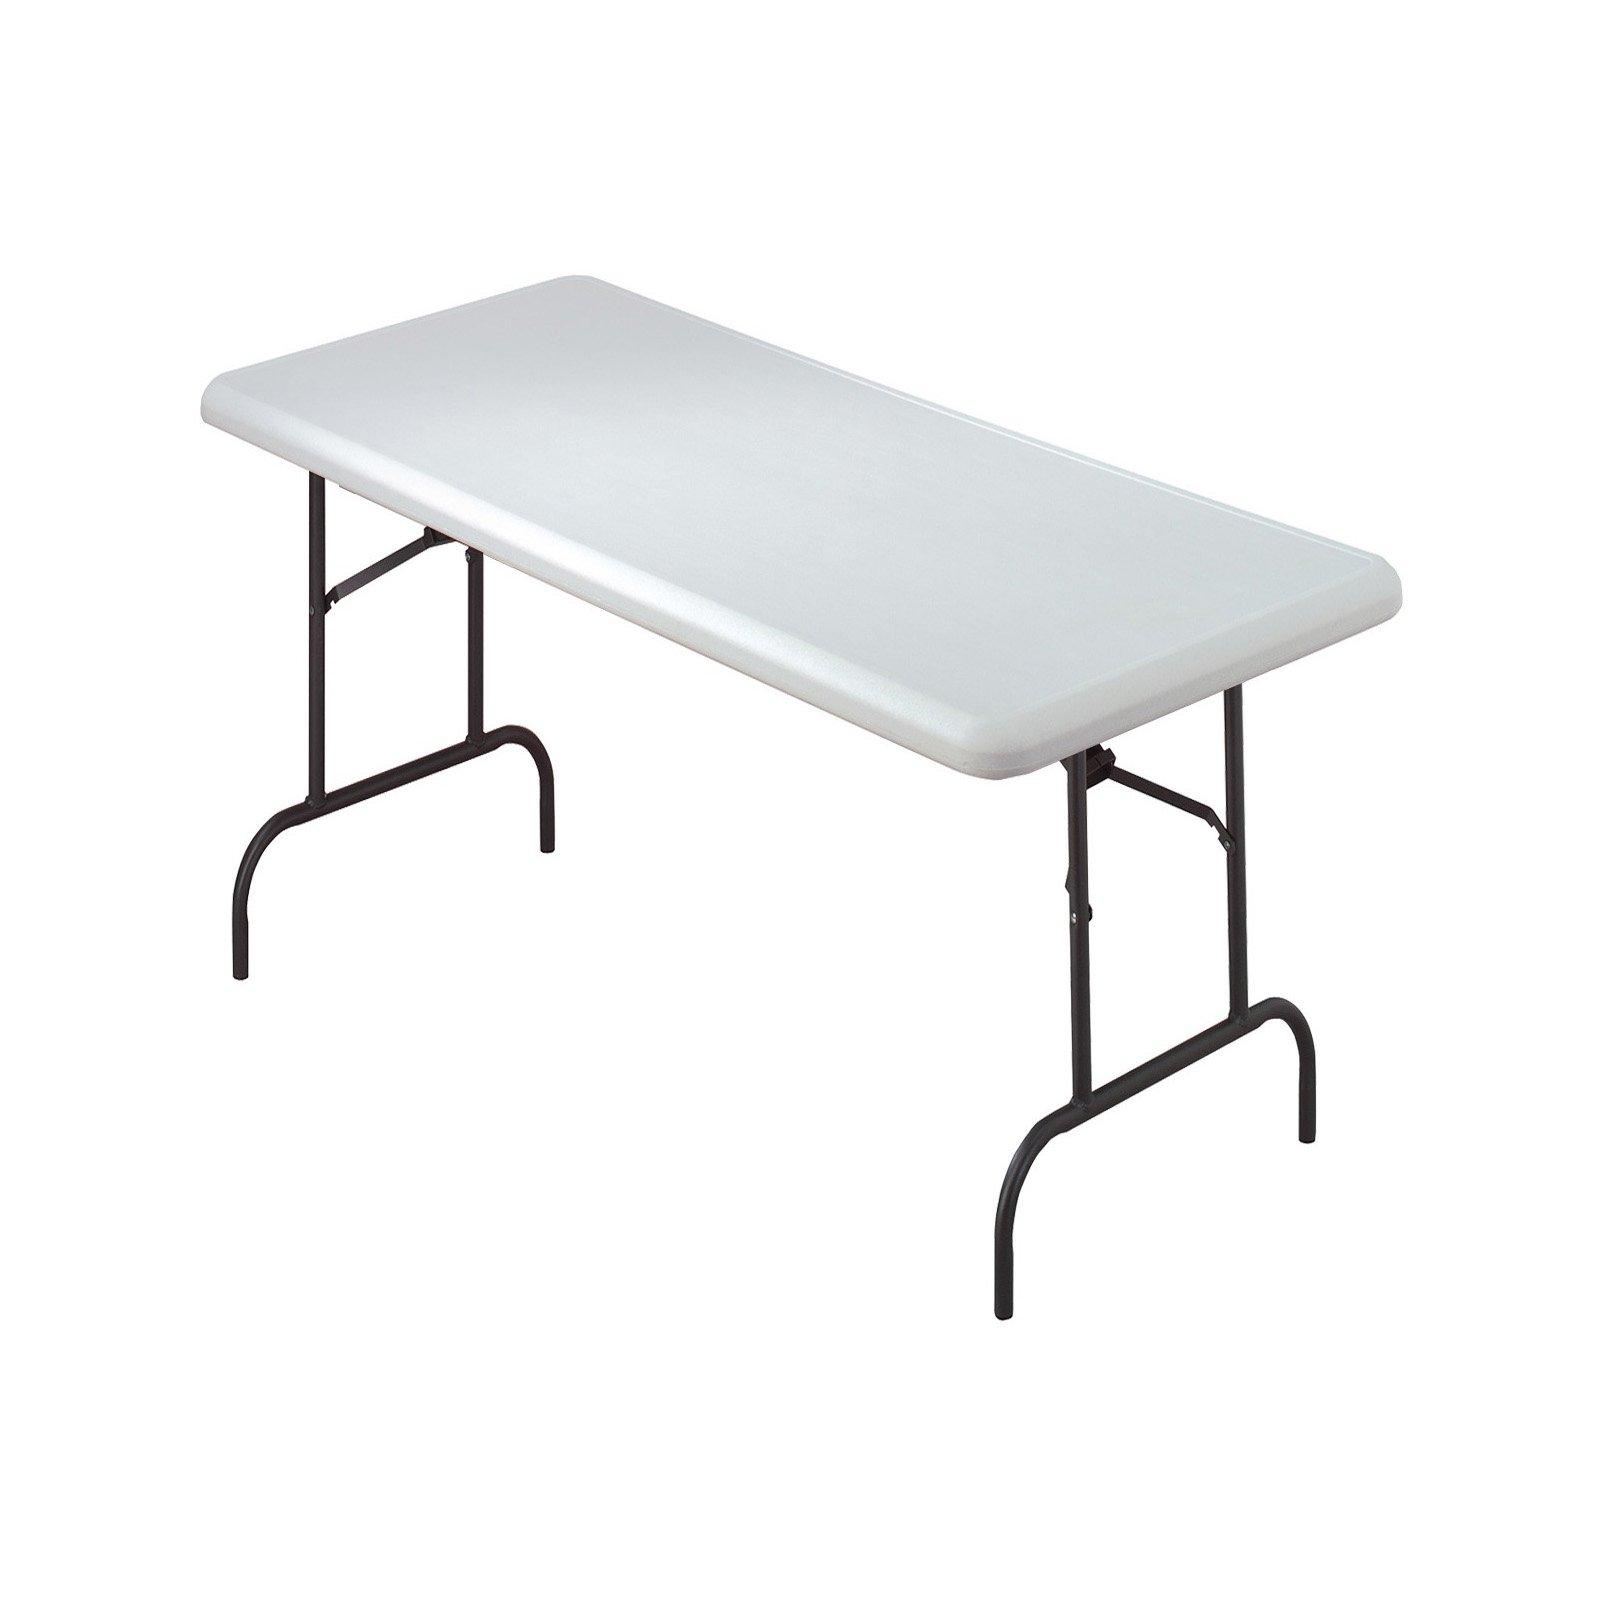 Iceberg 600 Series Utility Table - 30 x 60